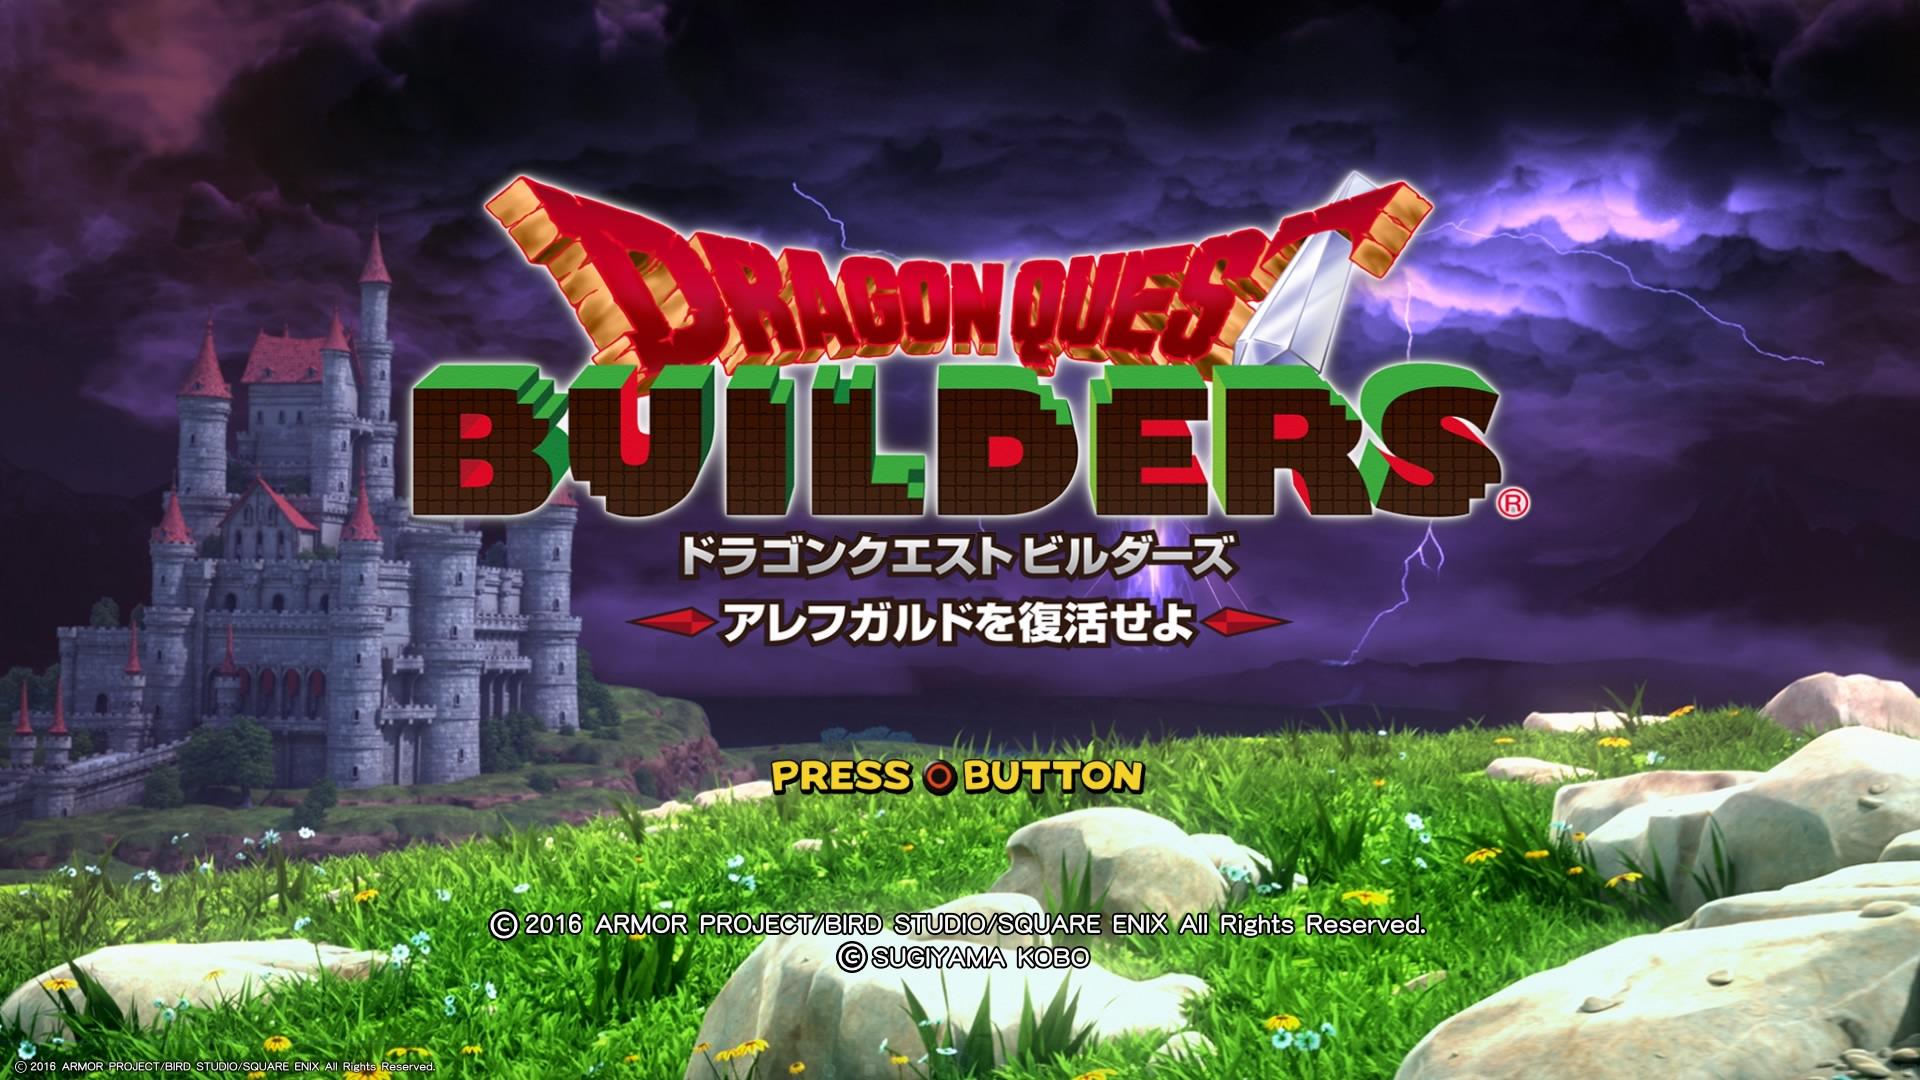 DRAGON QUEST BUILDERS タイトル